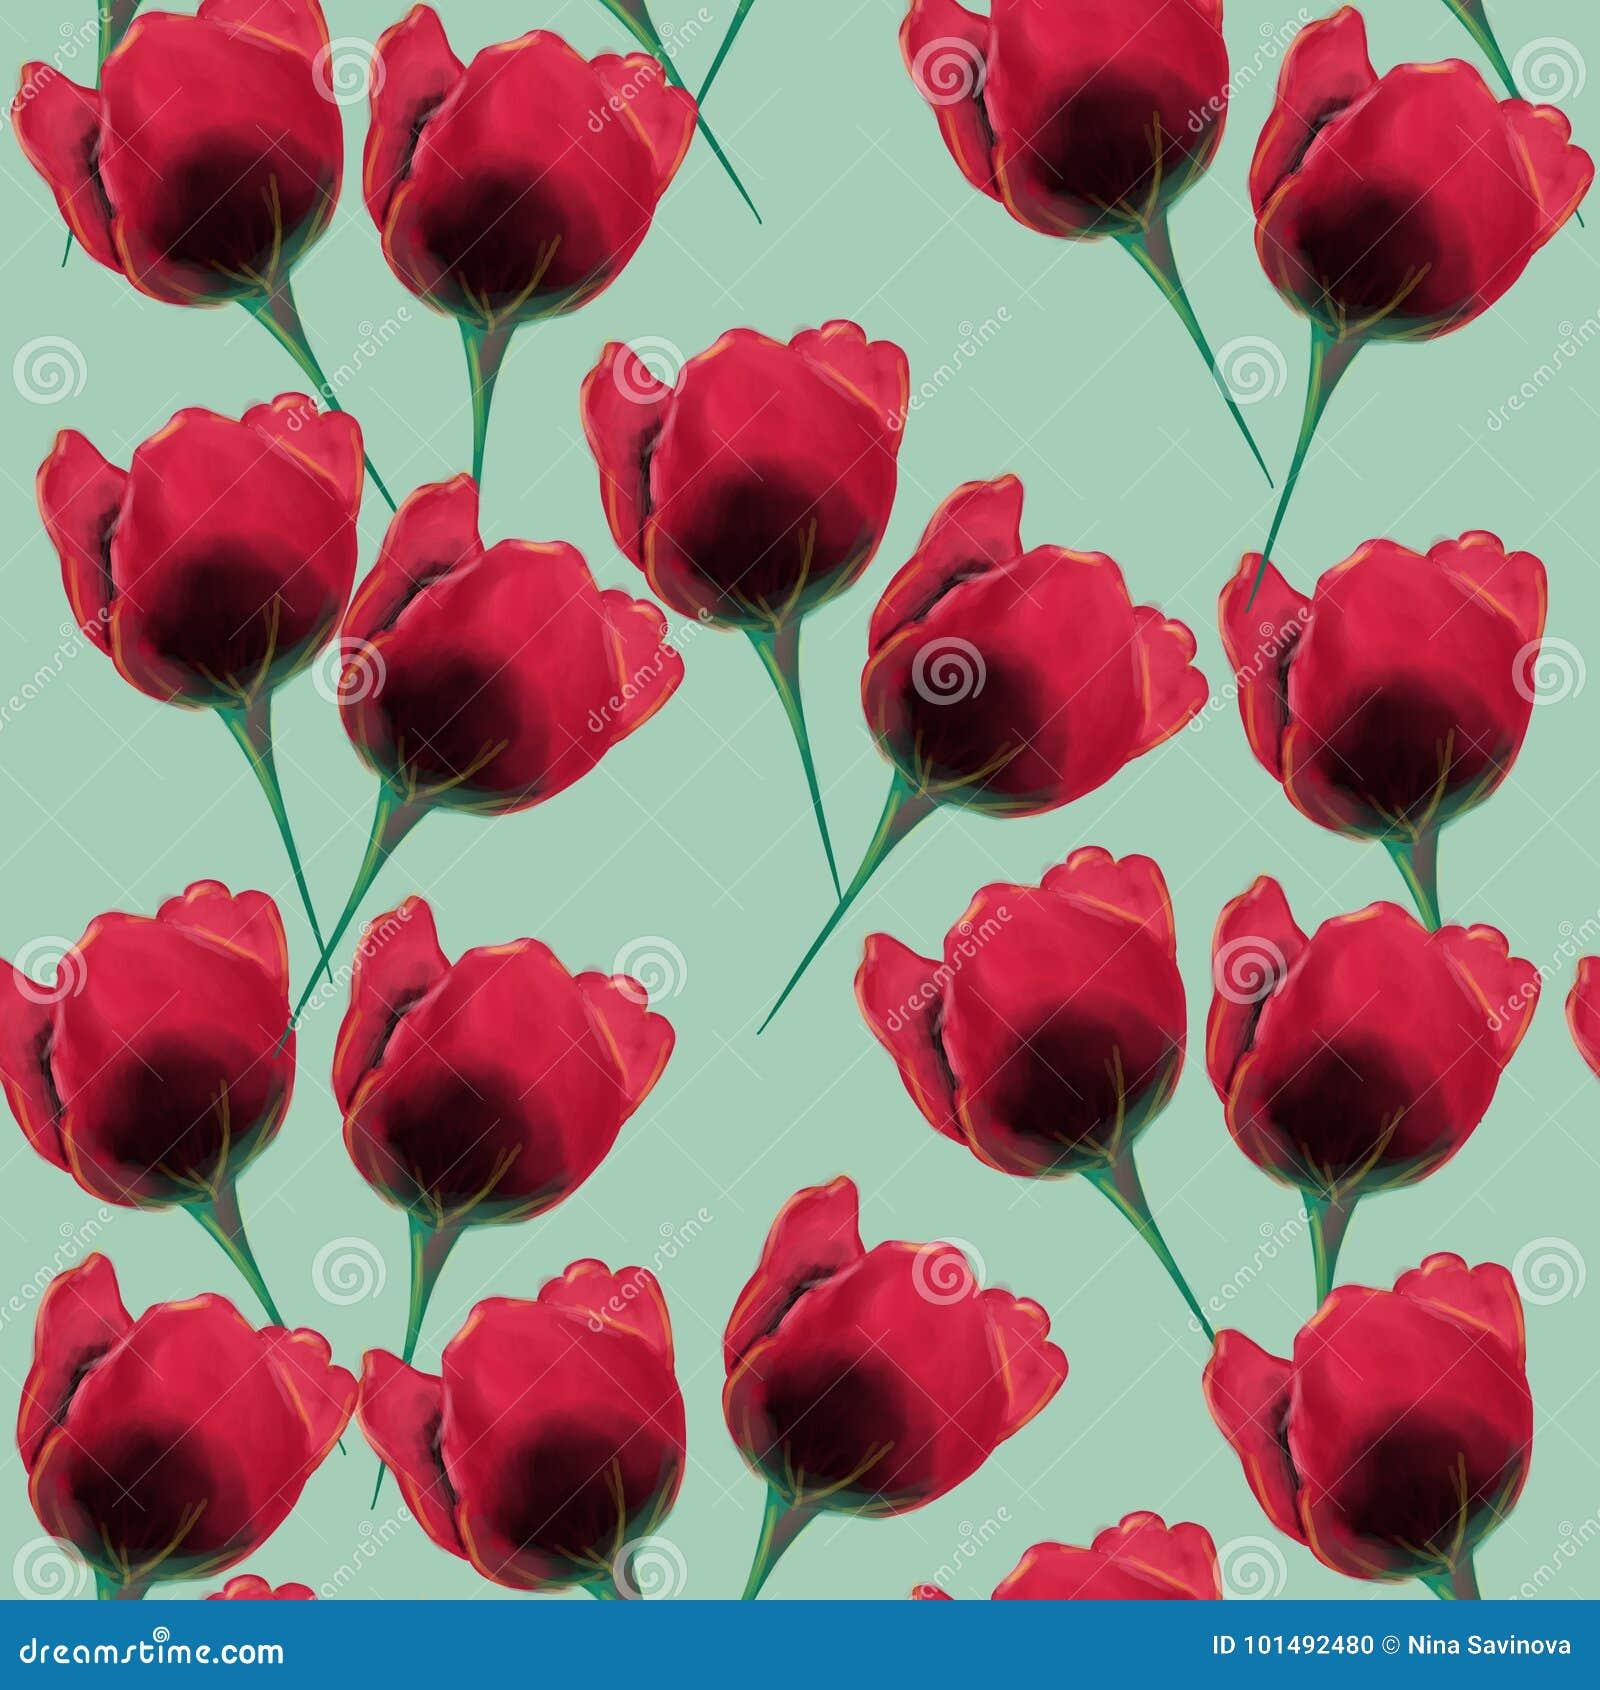 Beautiful and colorful tulpan flower seamless pattern